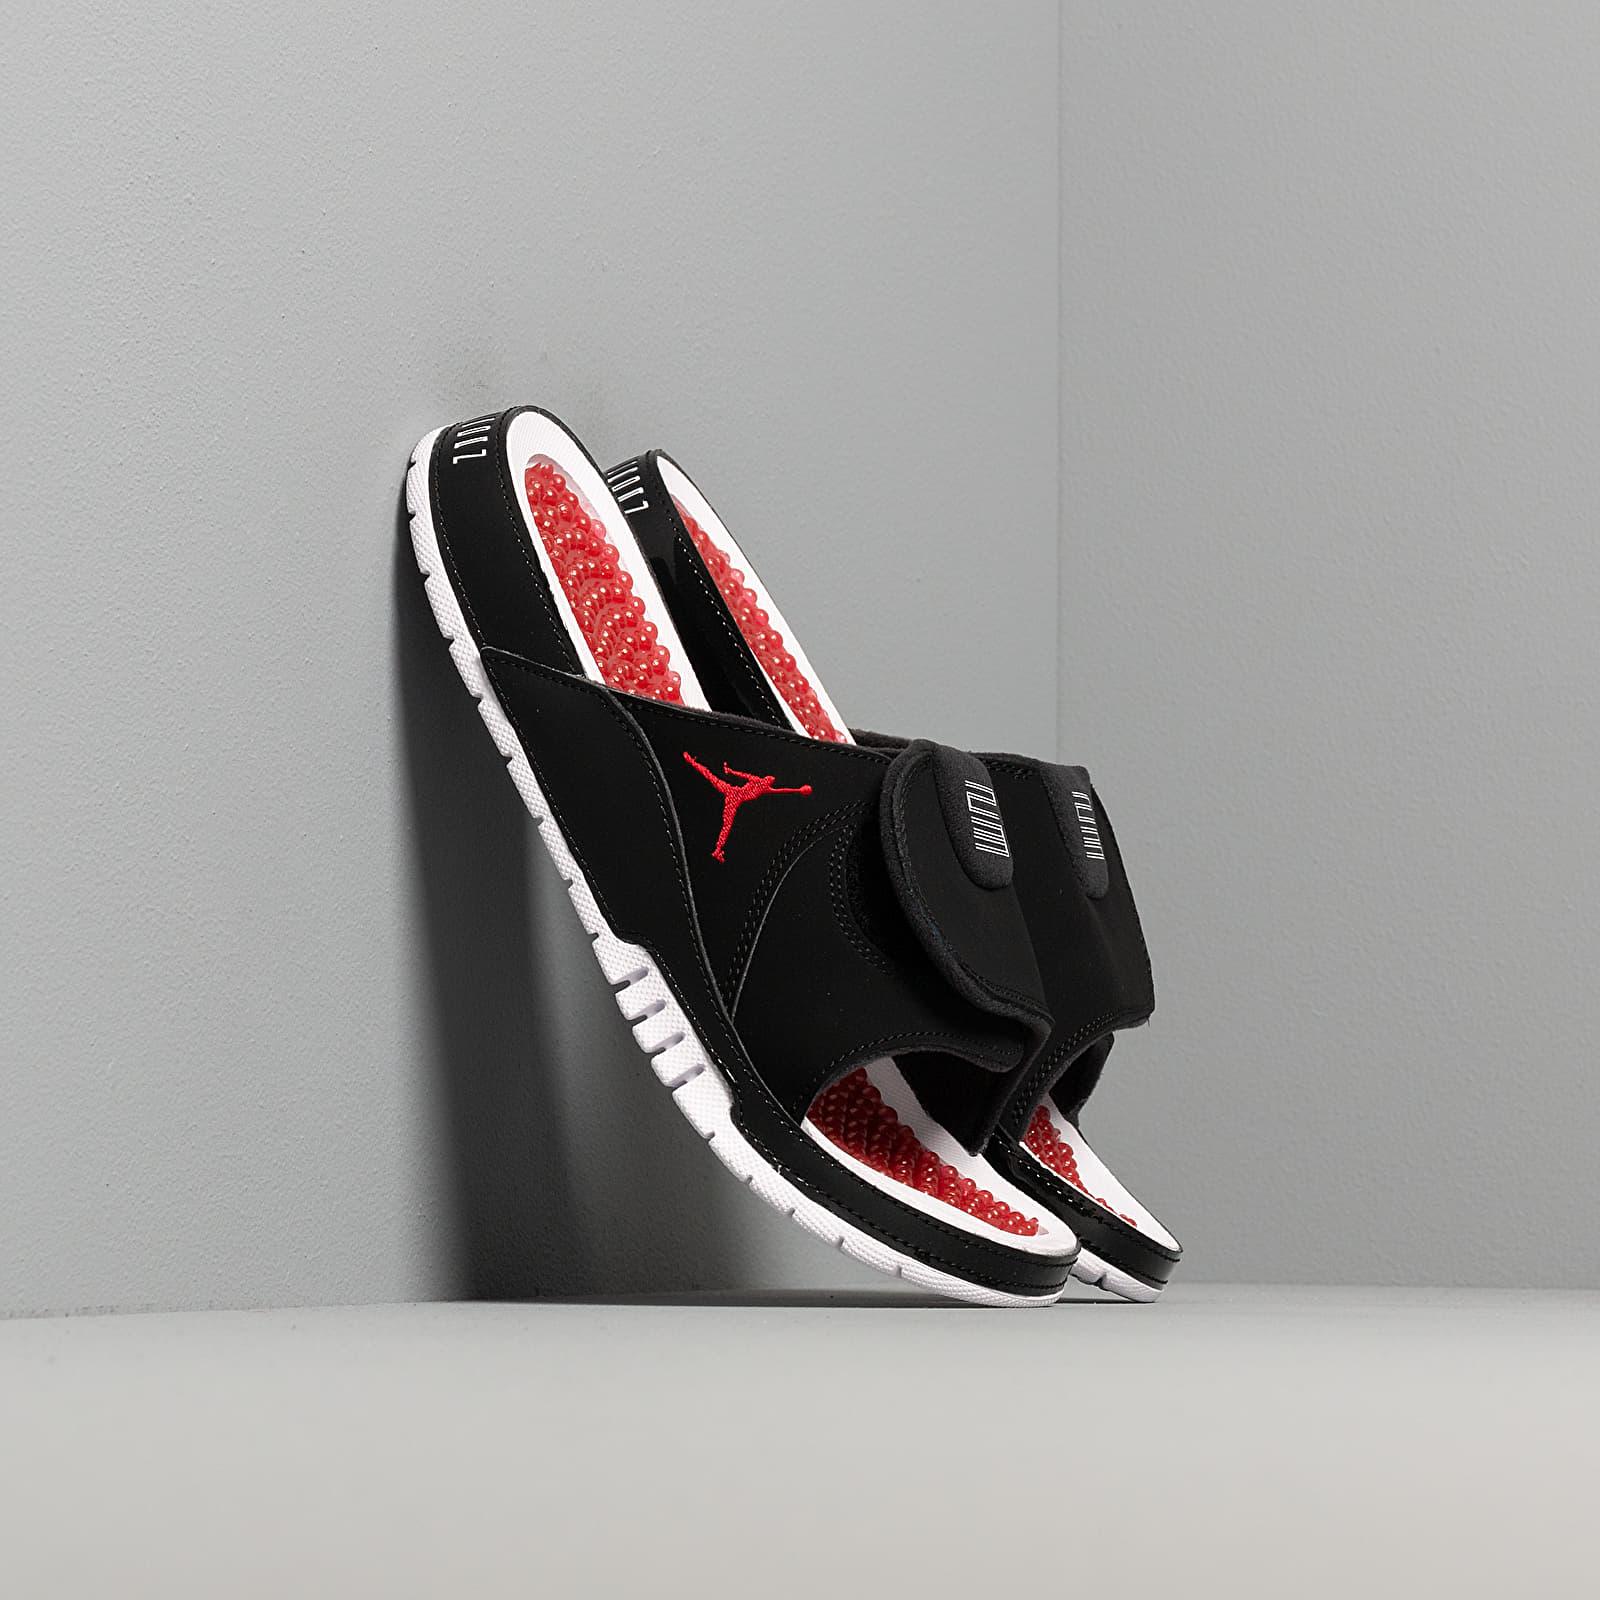 Jordan Hydro Xi Retro